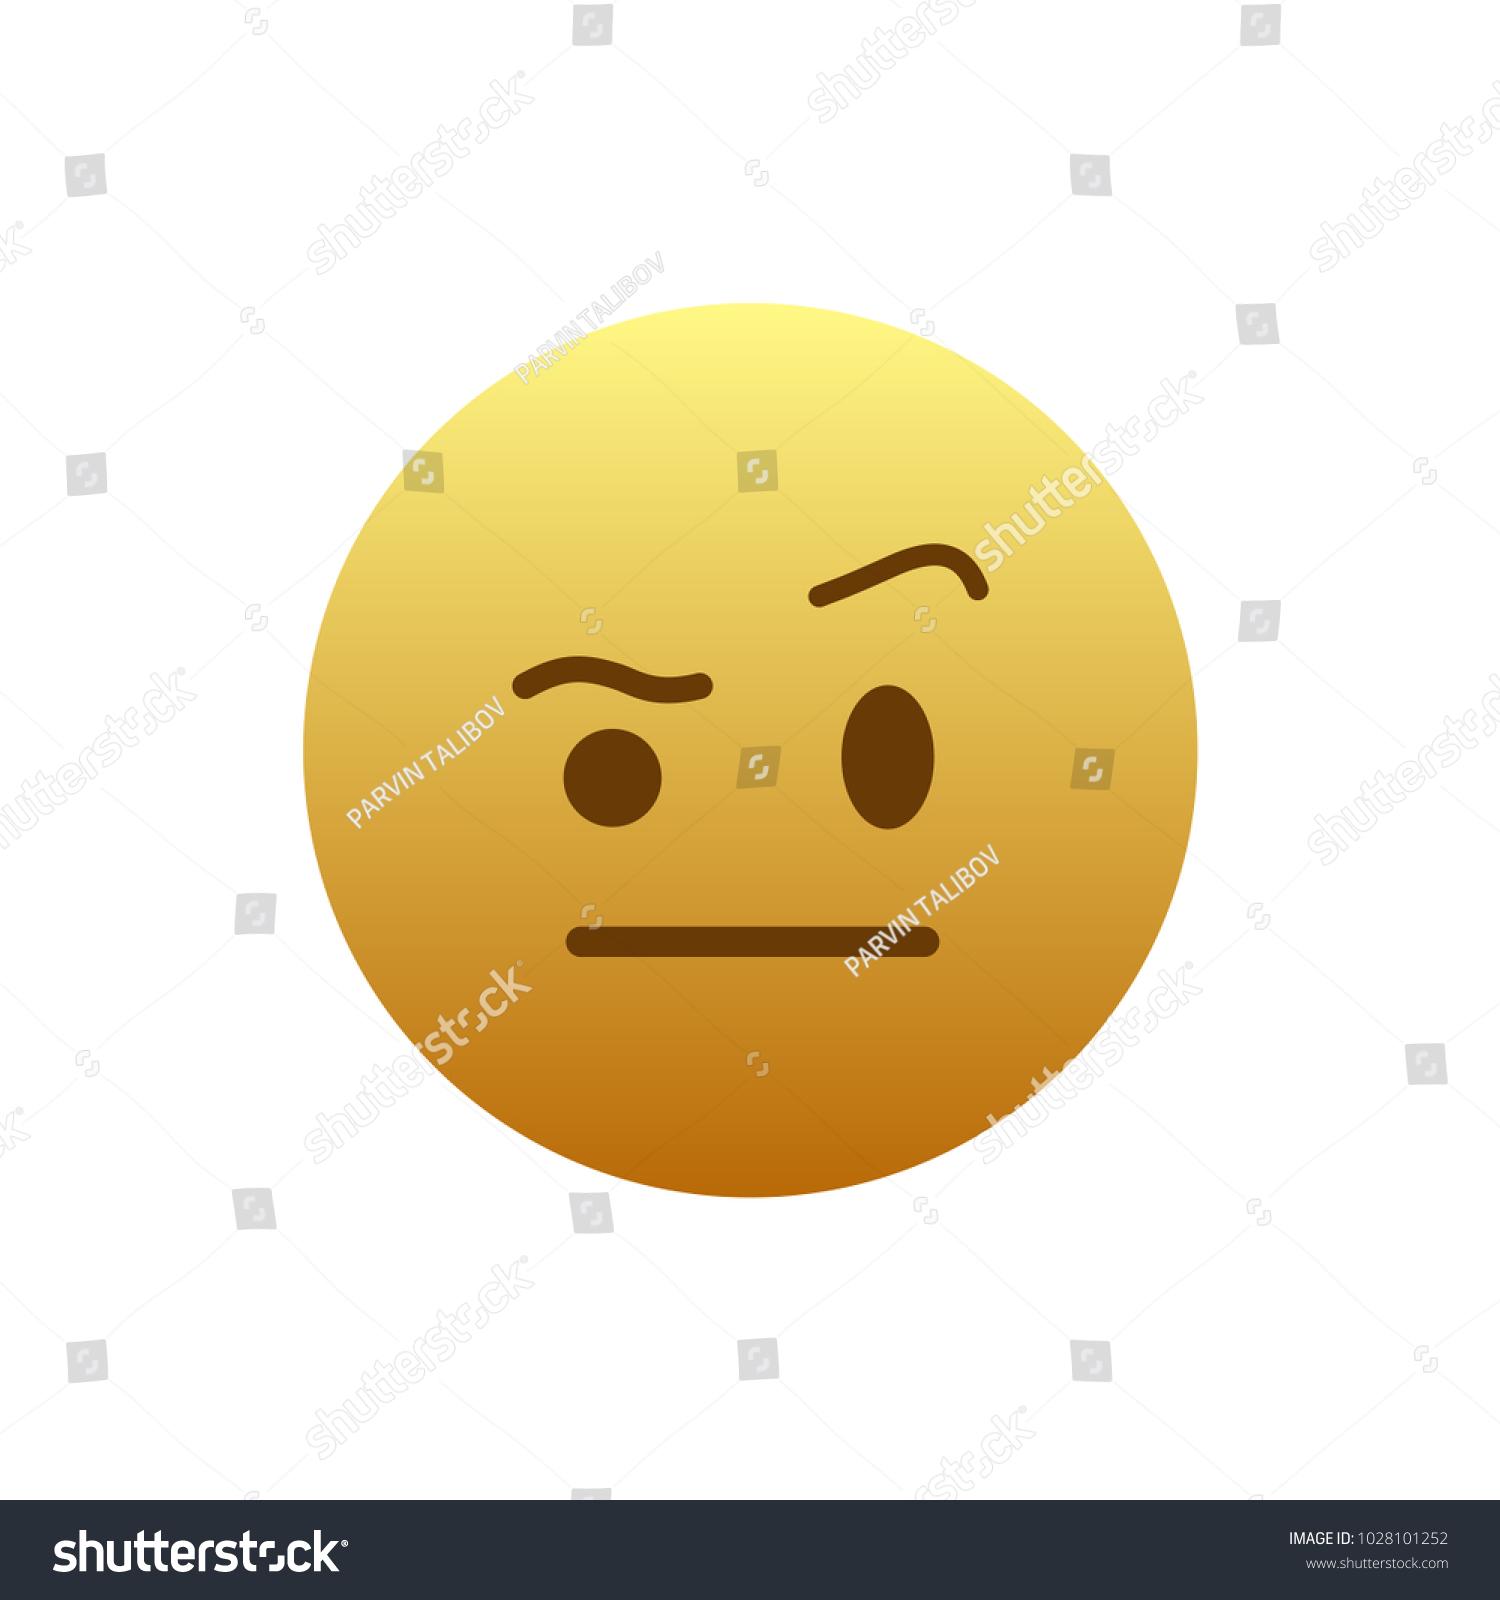 Eyebrow Raised Emoji Stock Vector Royalty Free 1028101252